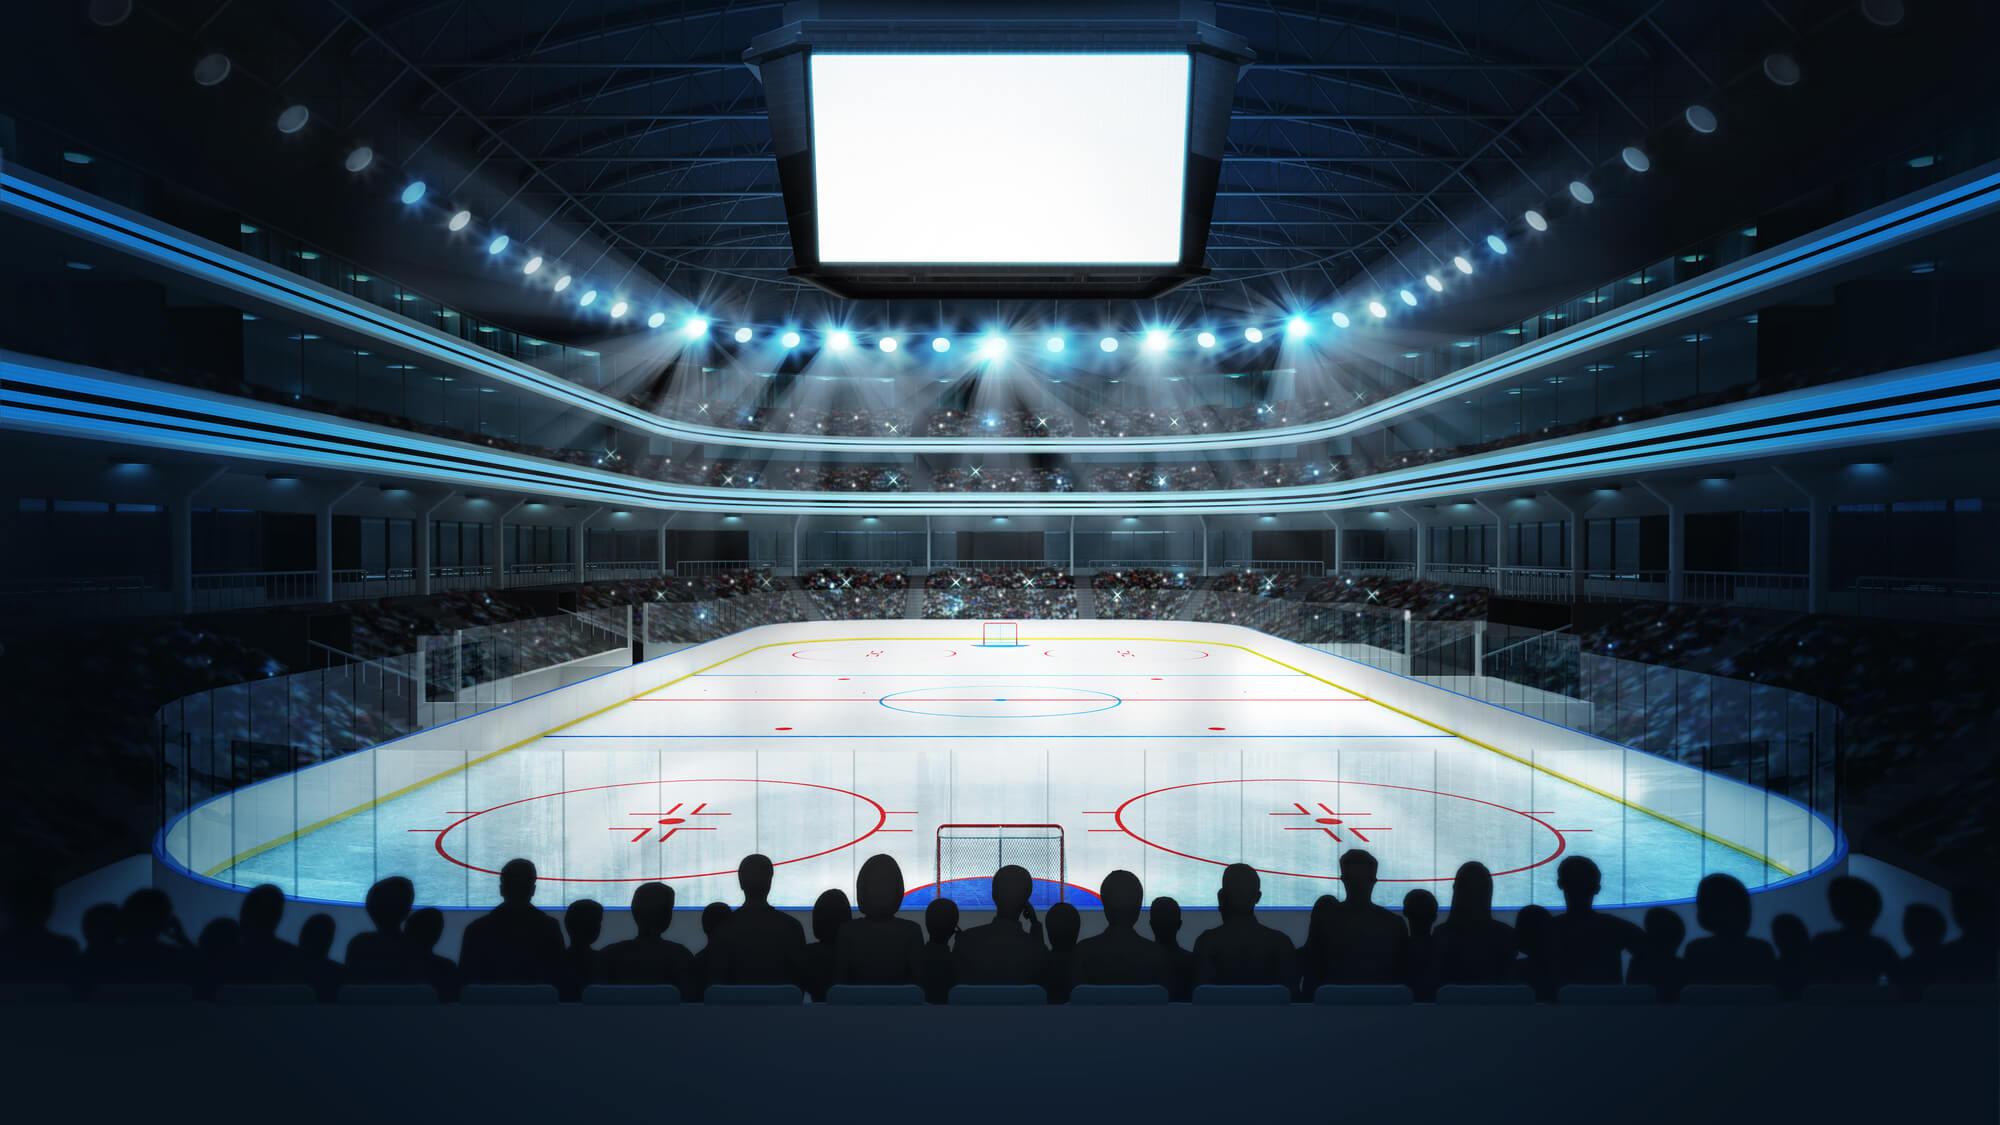 Hockey Stadium with Fans